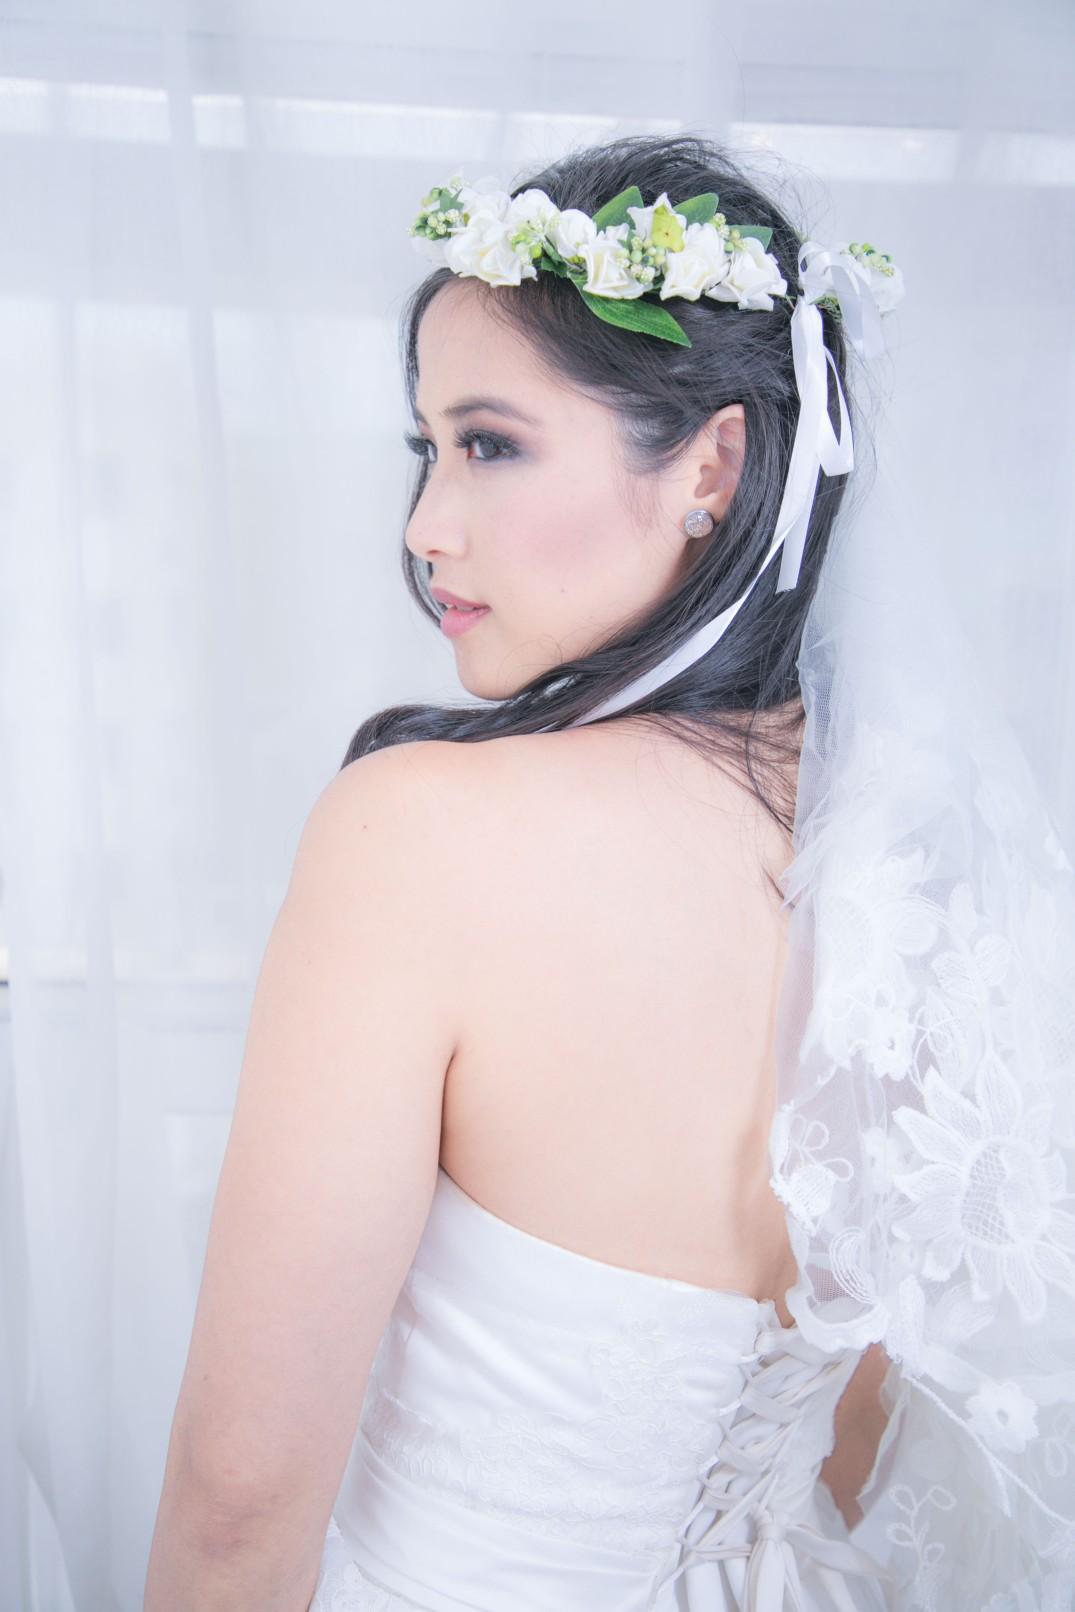 wedding boudoir photography HK by paulstylist-2